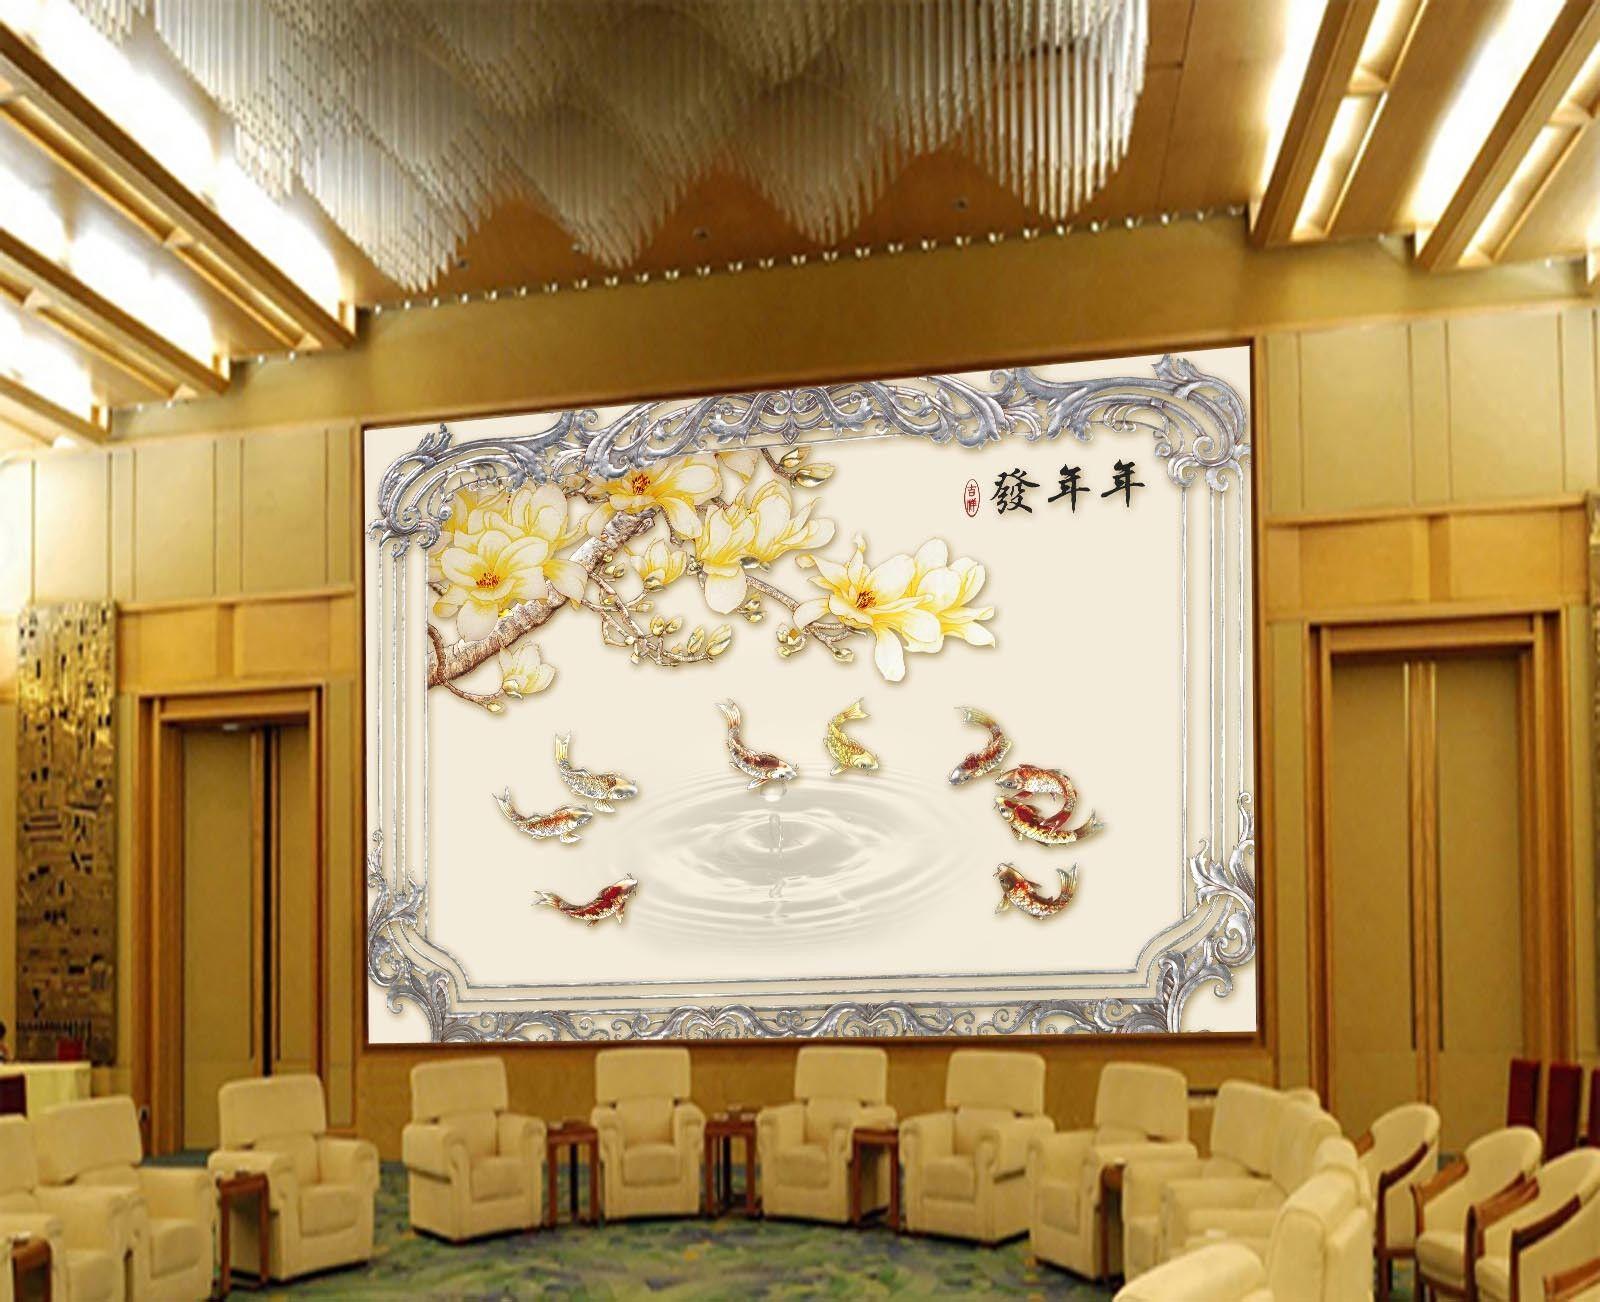 3D Exquisite Fishs 74 Wall Paper Murals Wall Print Wall Wallpaper Mural AU  Kyra